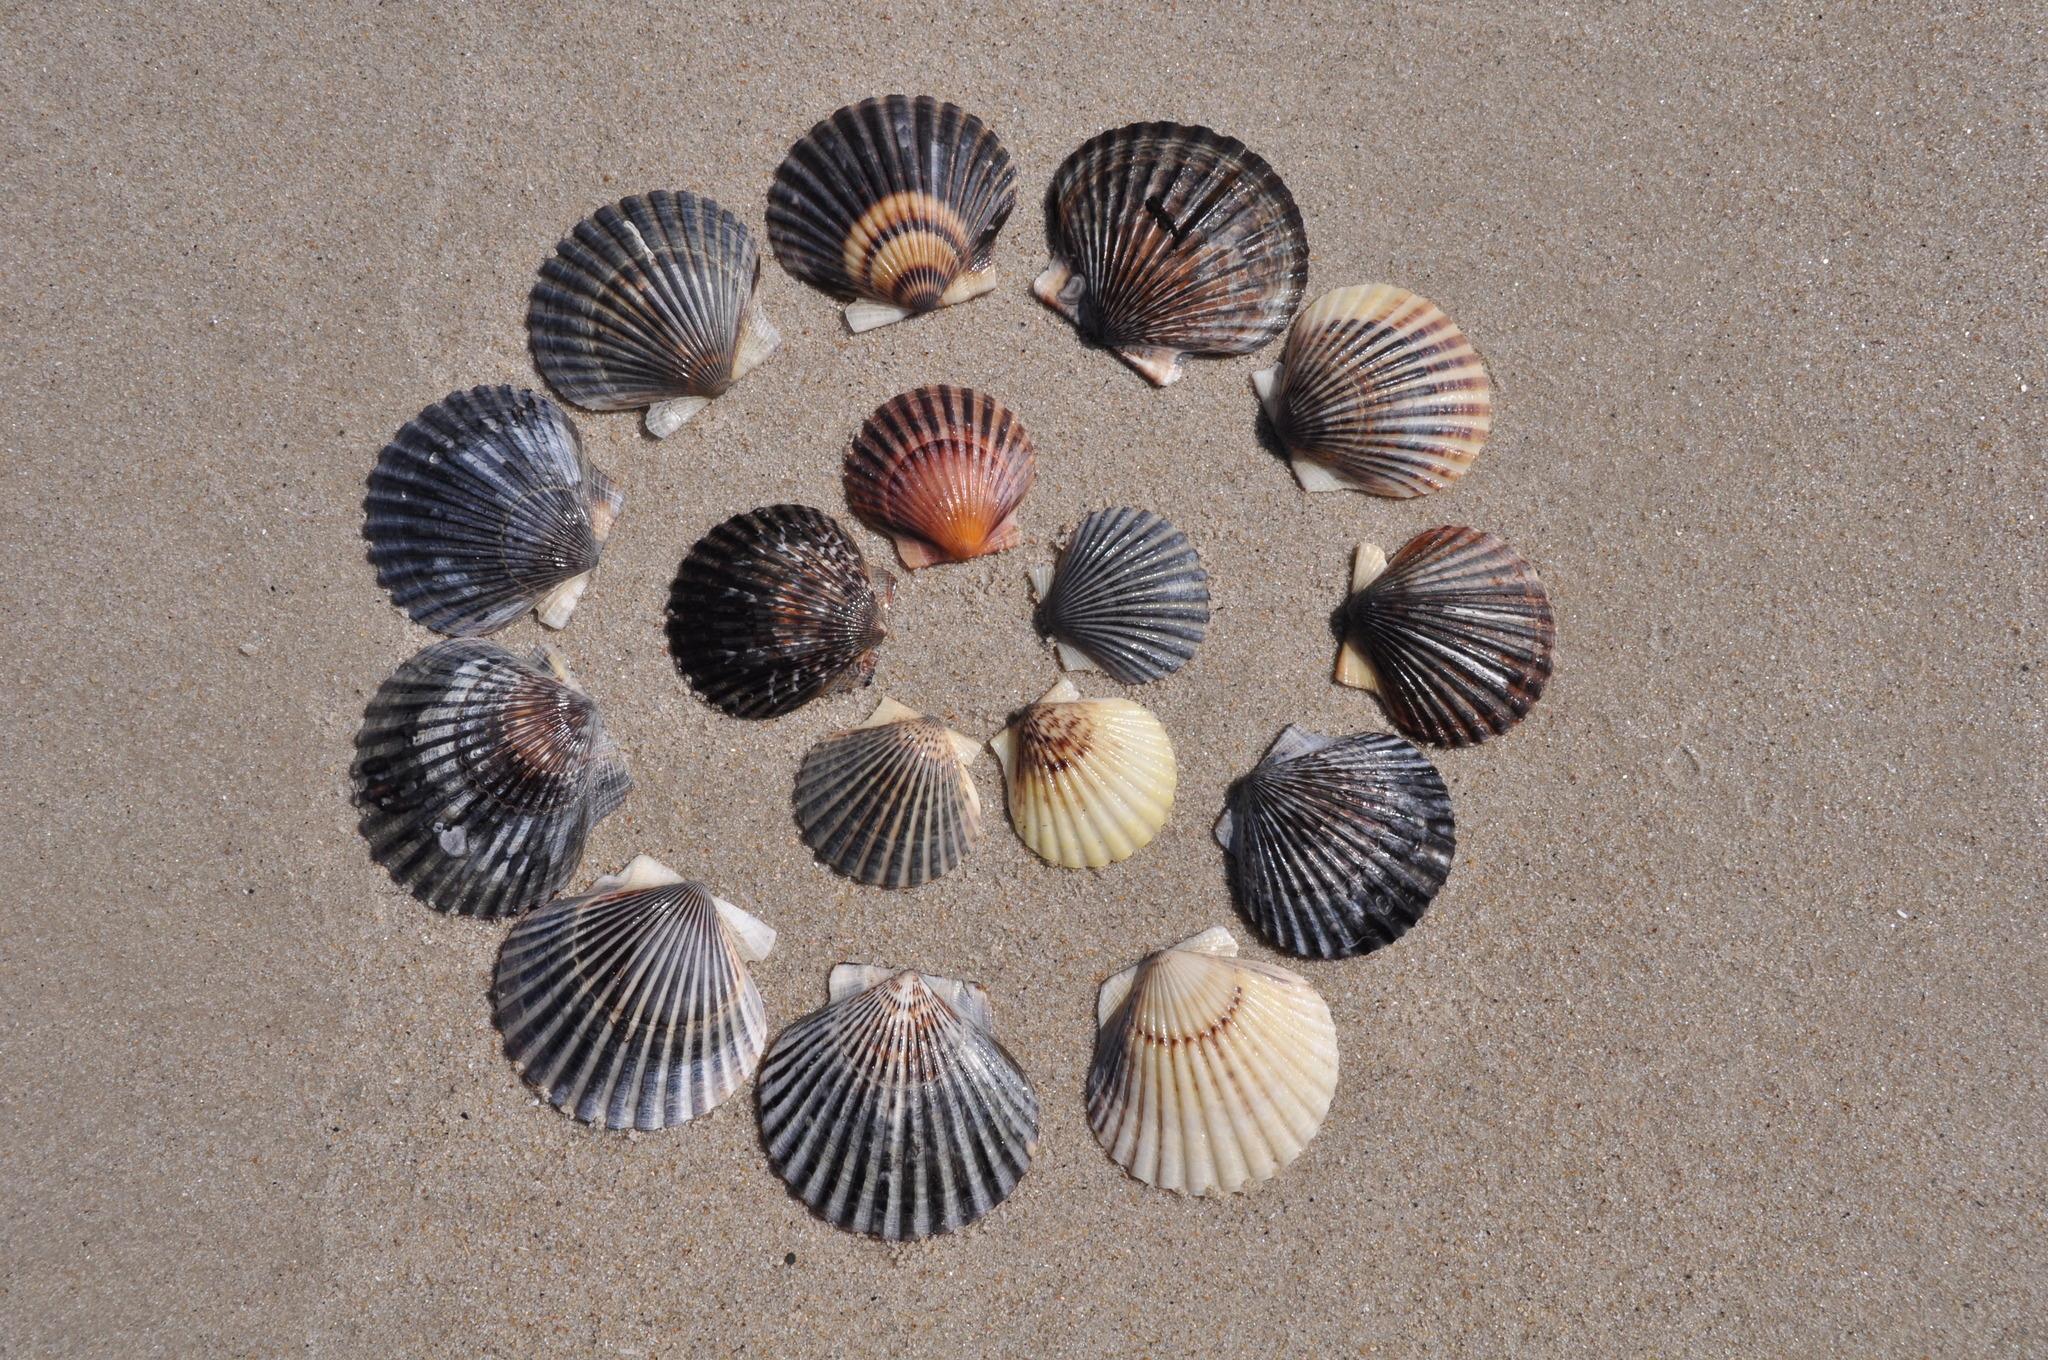 Image of Common scallop